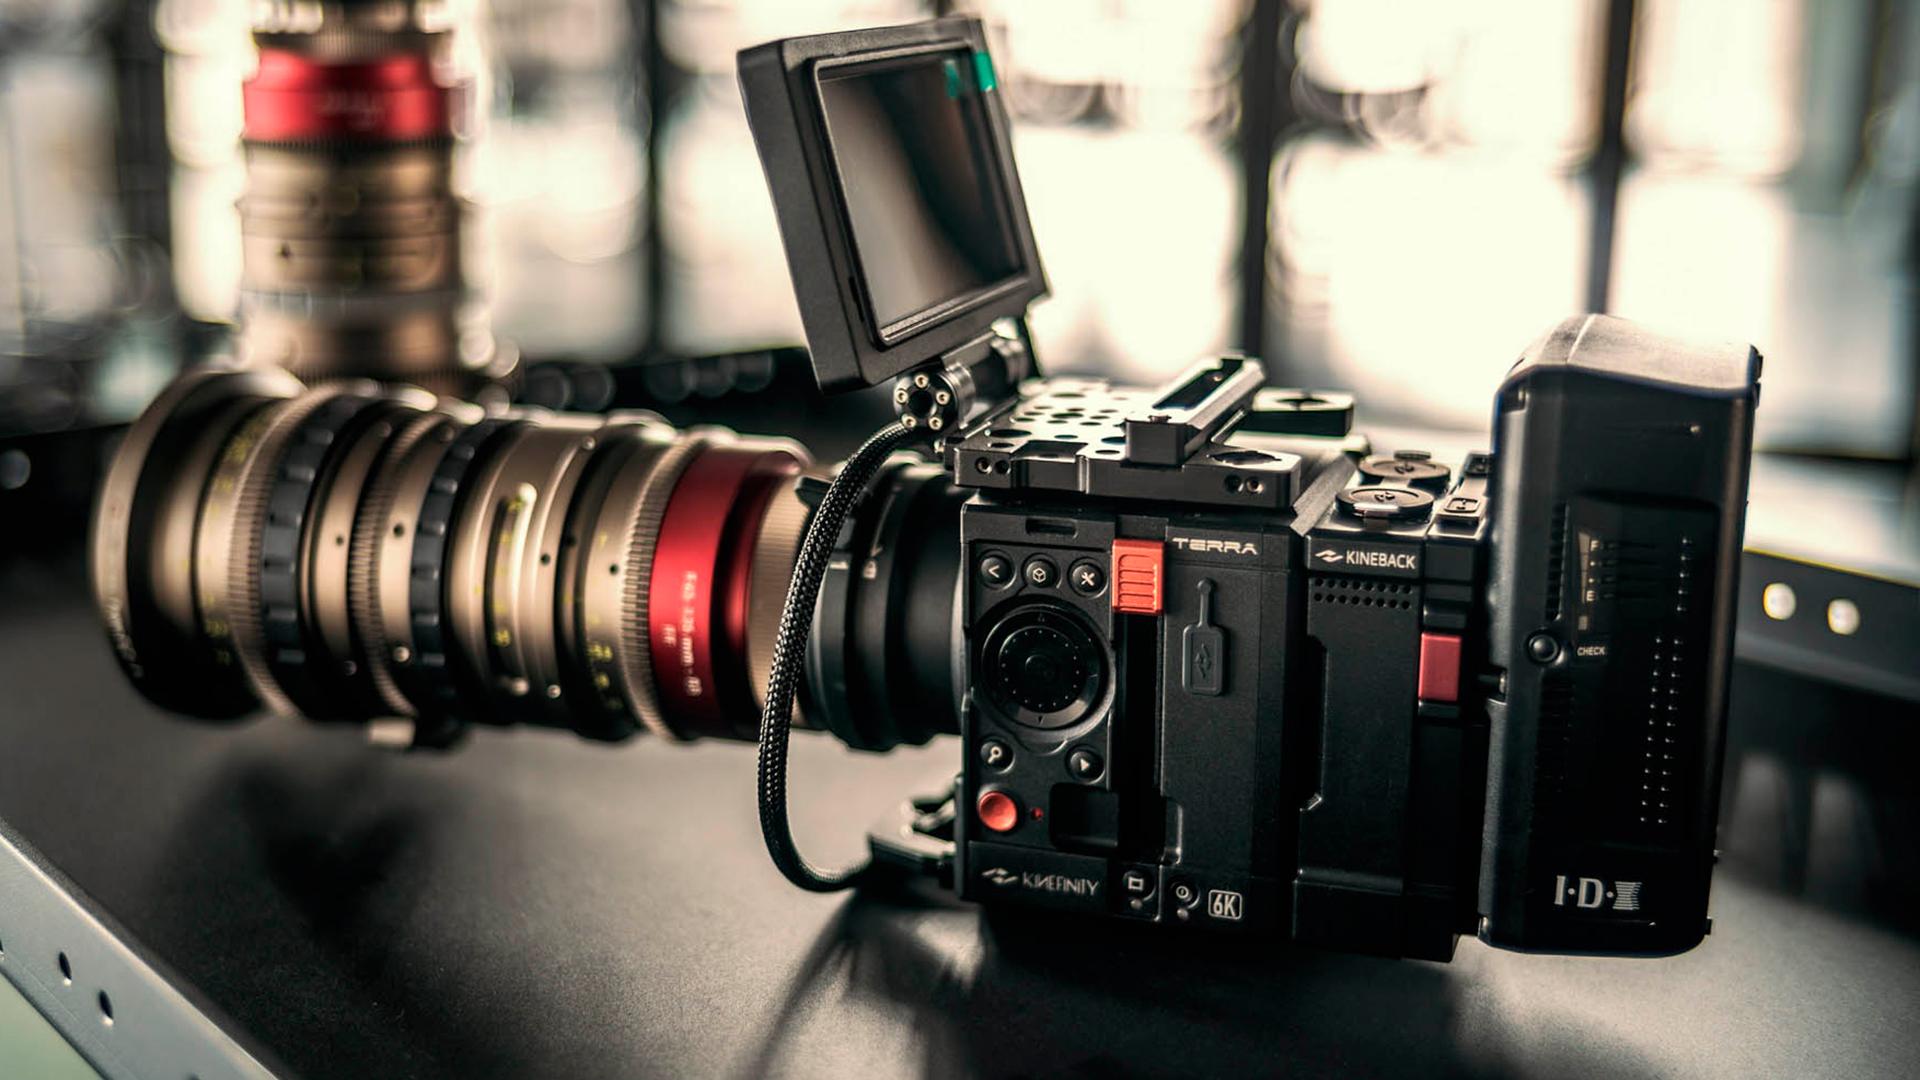 KinefinityがTerraカメラ用KineOS 6をリリース - 新しくなったUIと圧縮RAWを記録